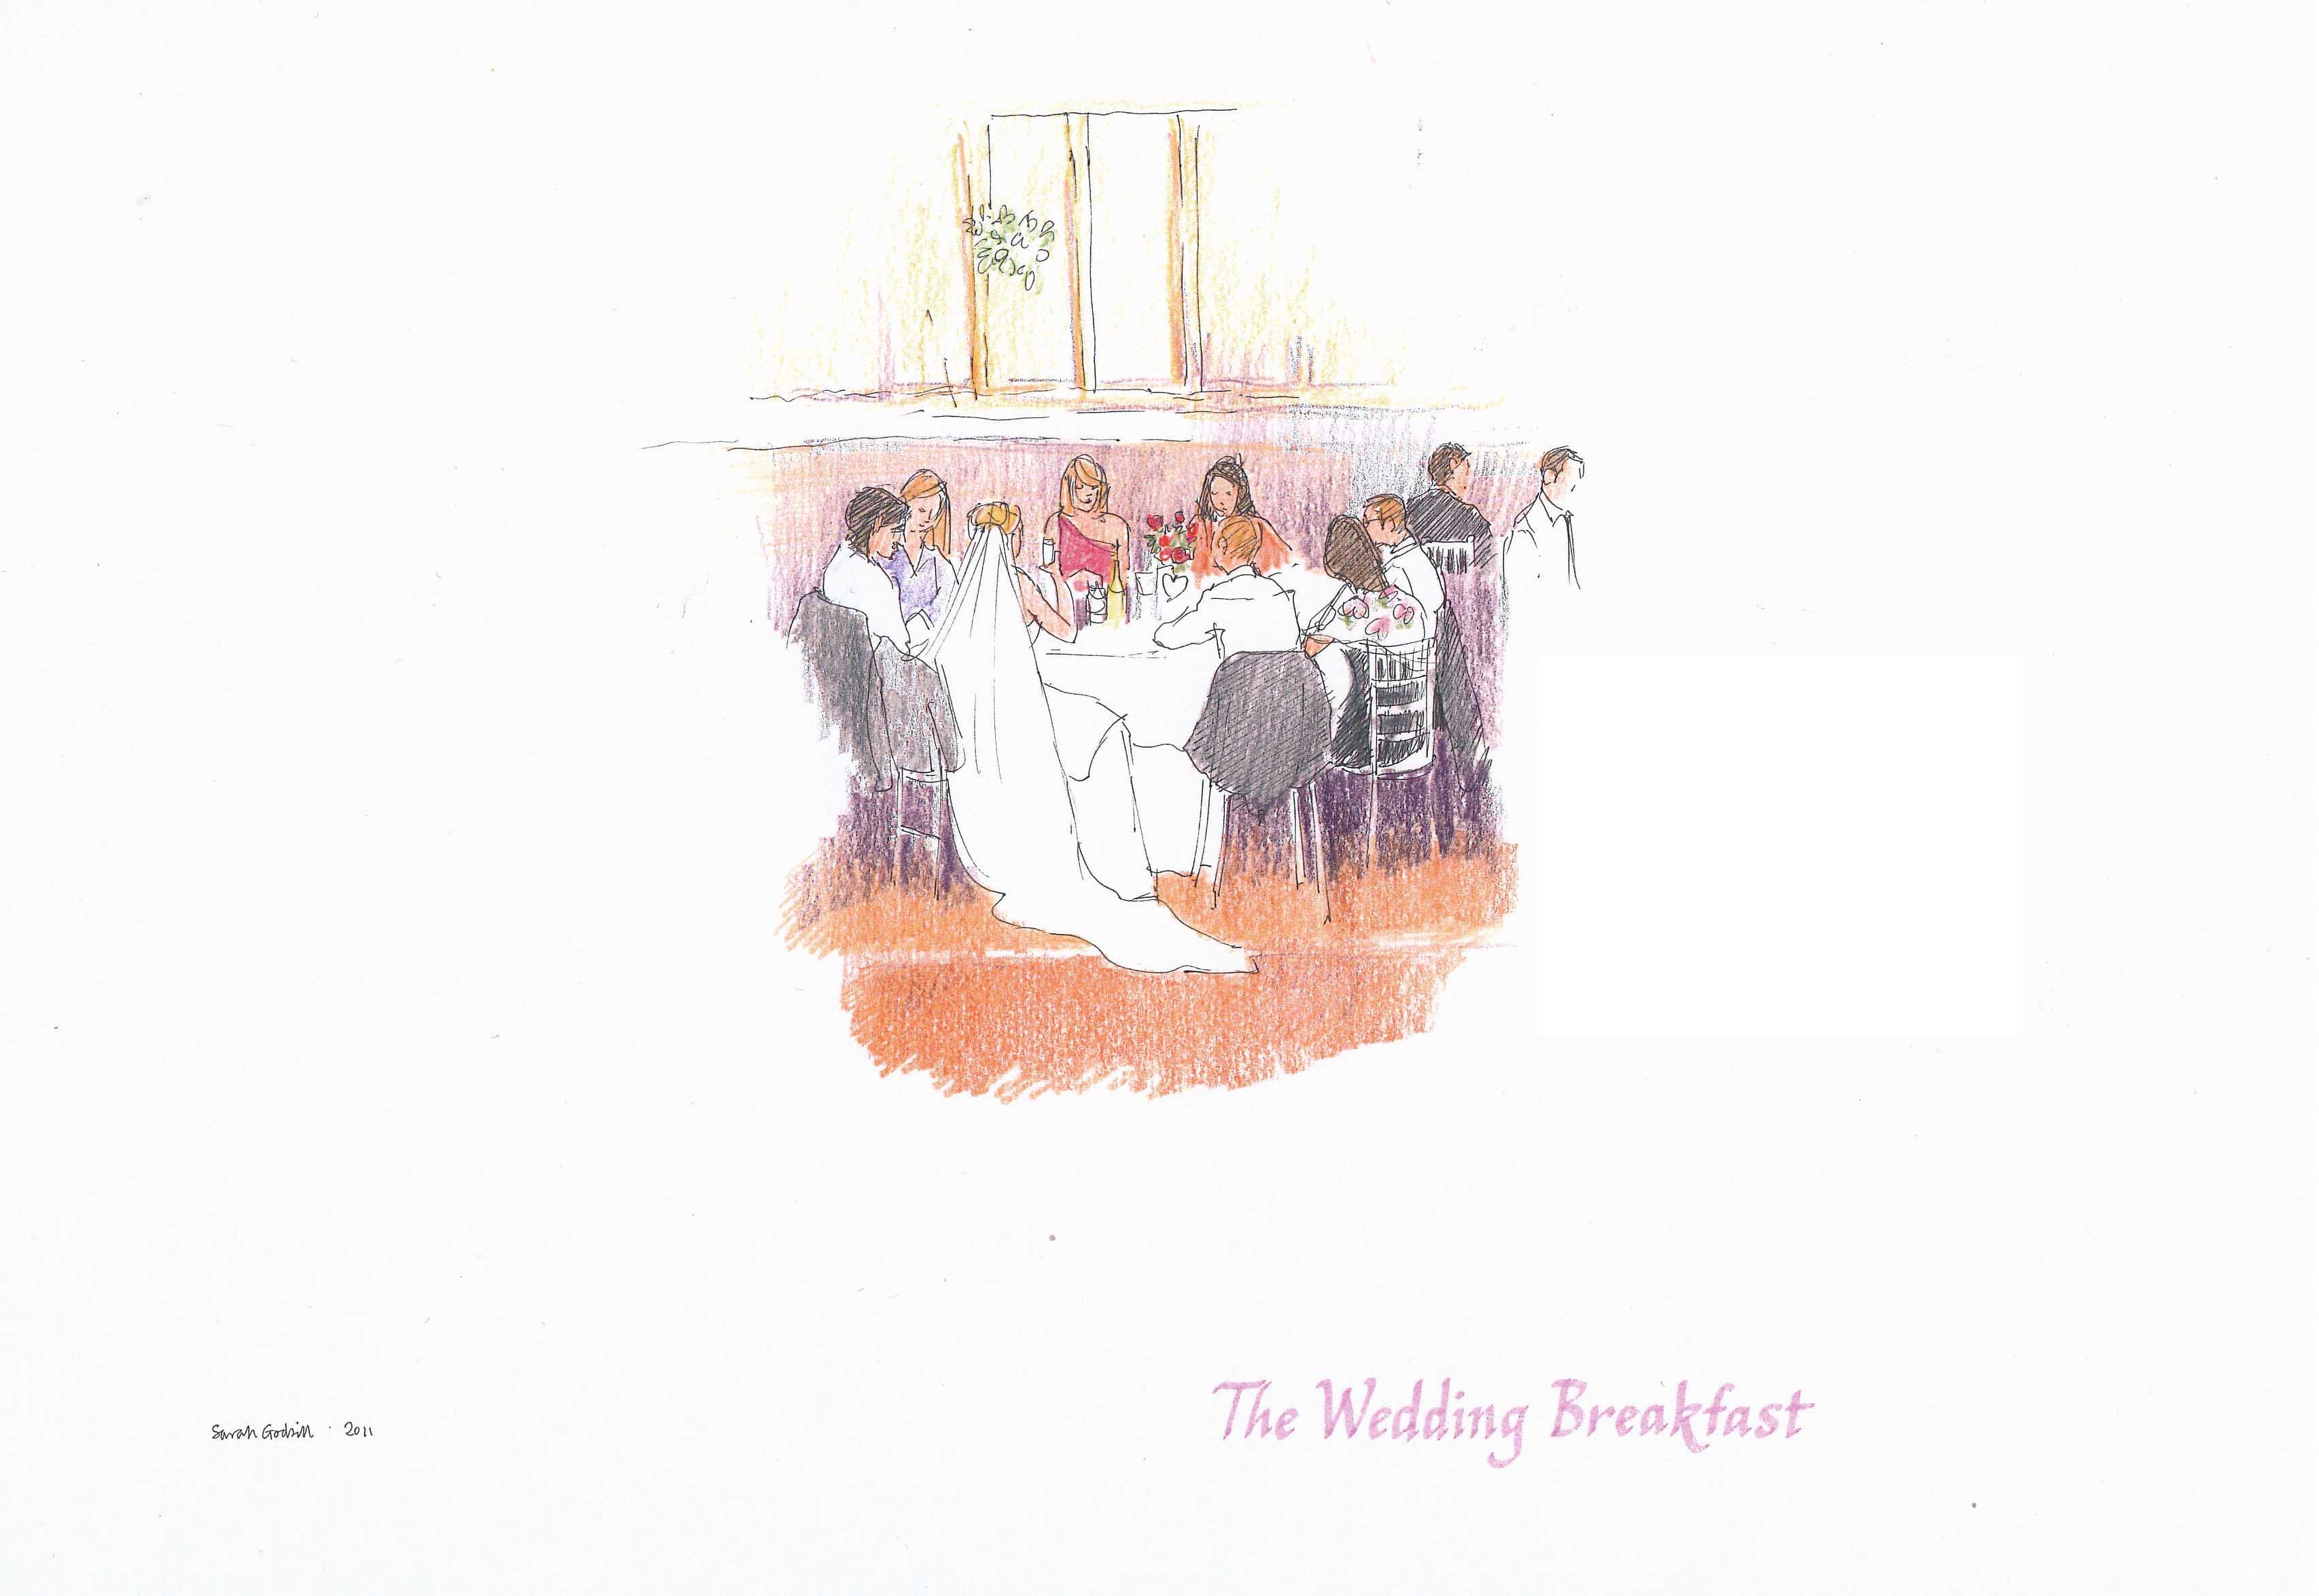 rolvenden-wedding-breakfast